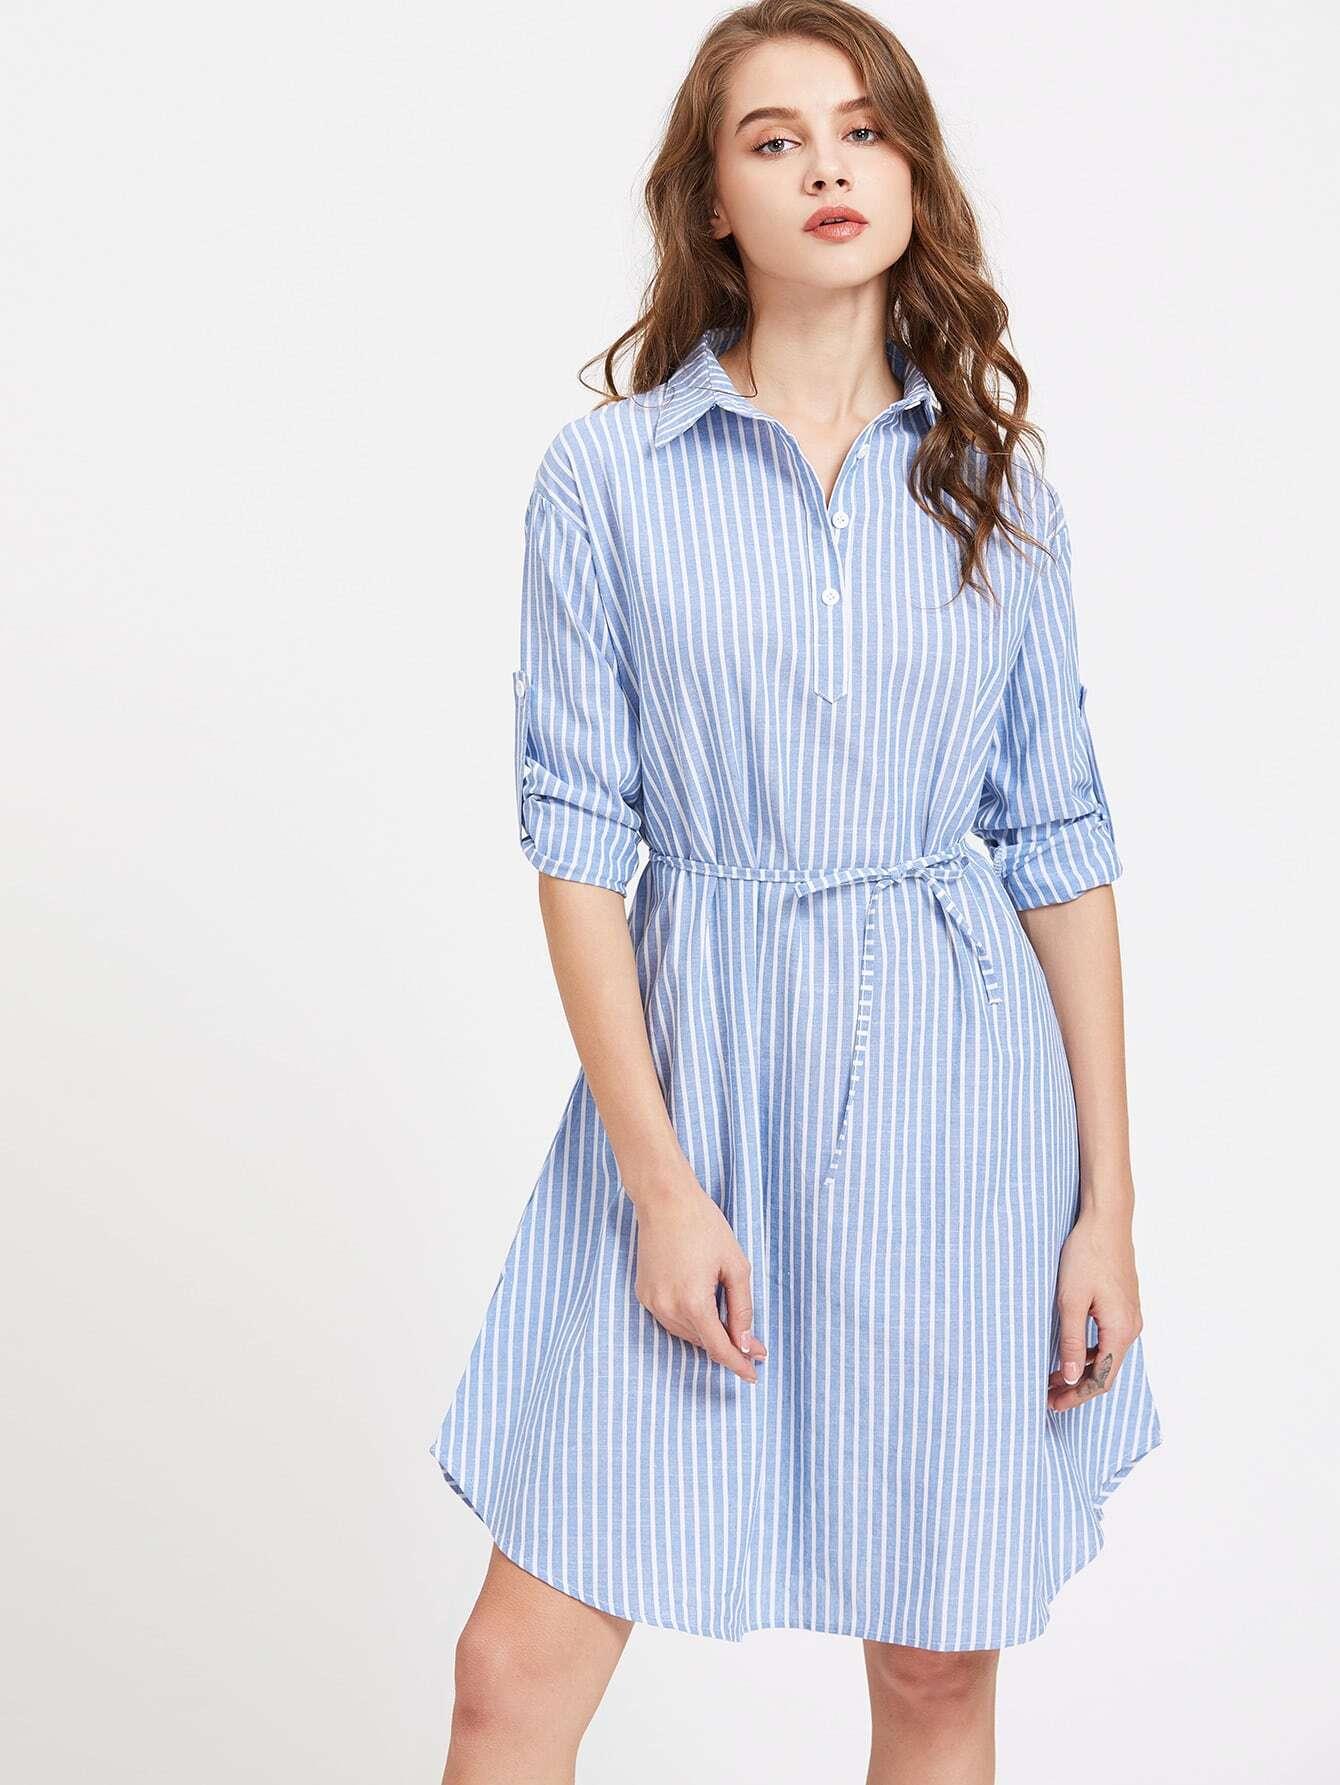 Фото Vertical Striped Roll Up Sleeve Self Tie Shirt Dress. Купить с доставкой